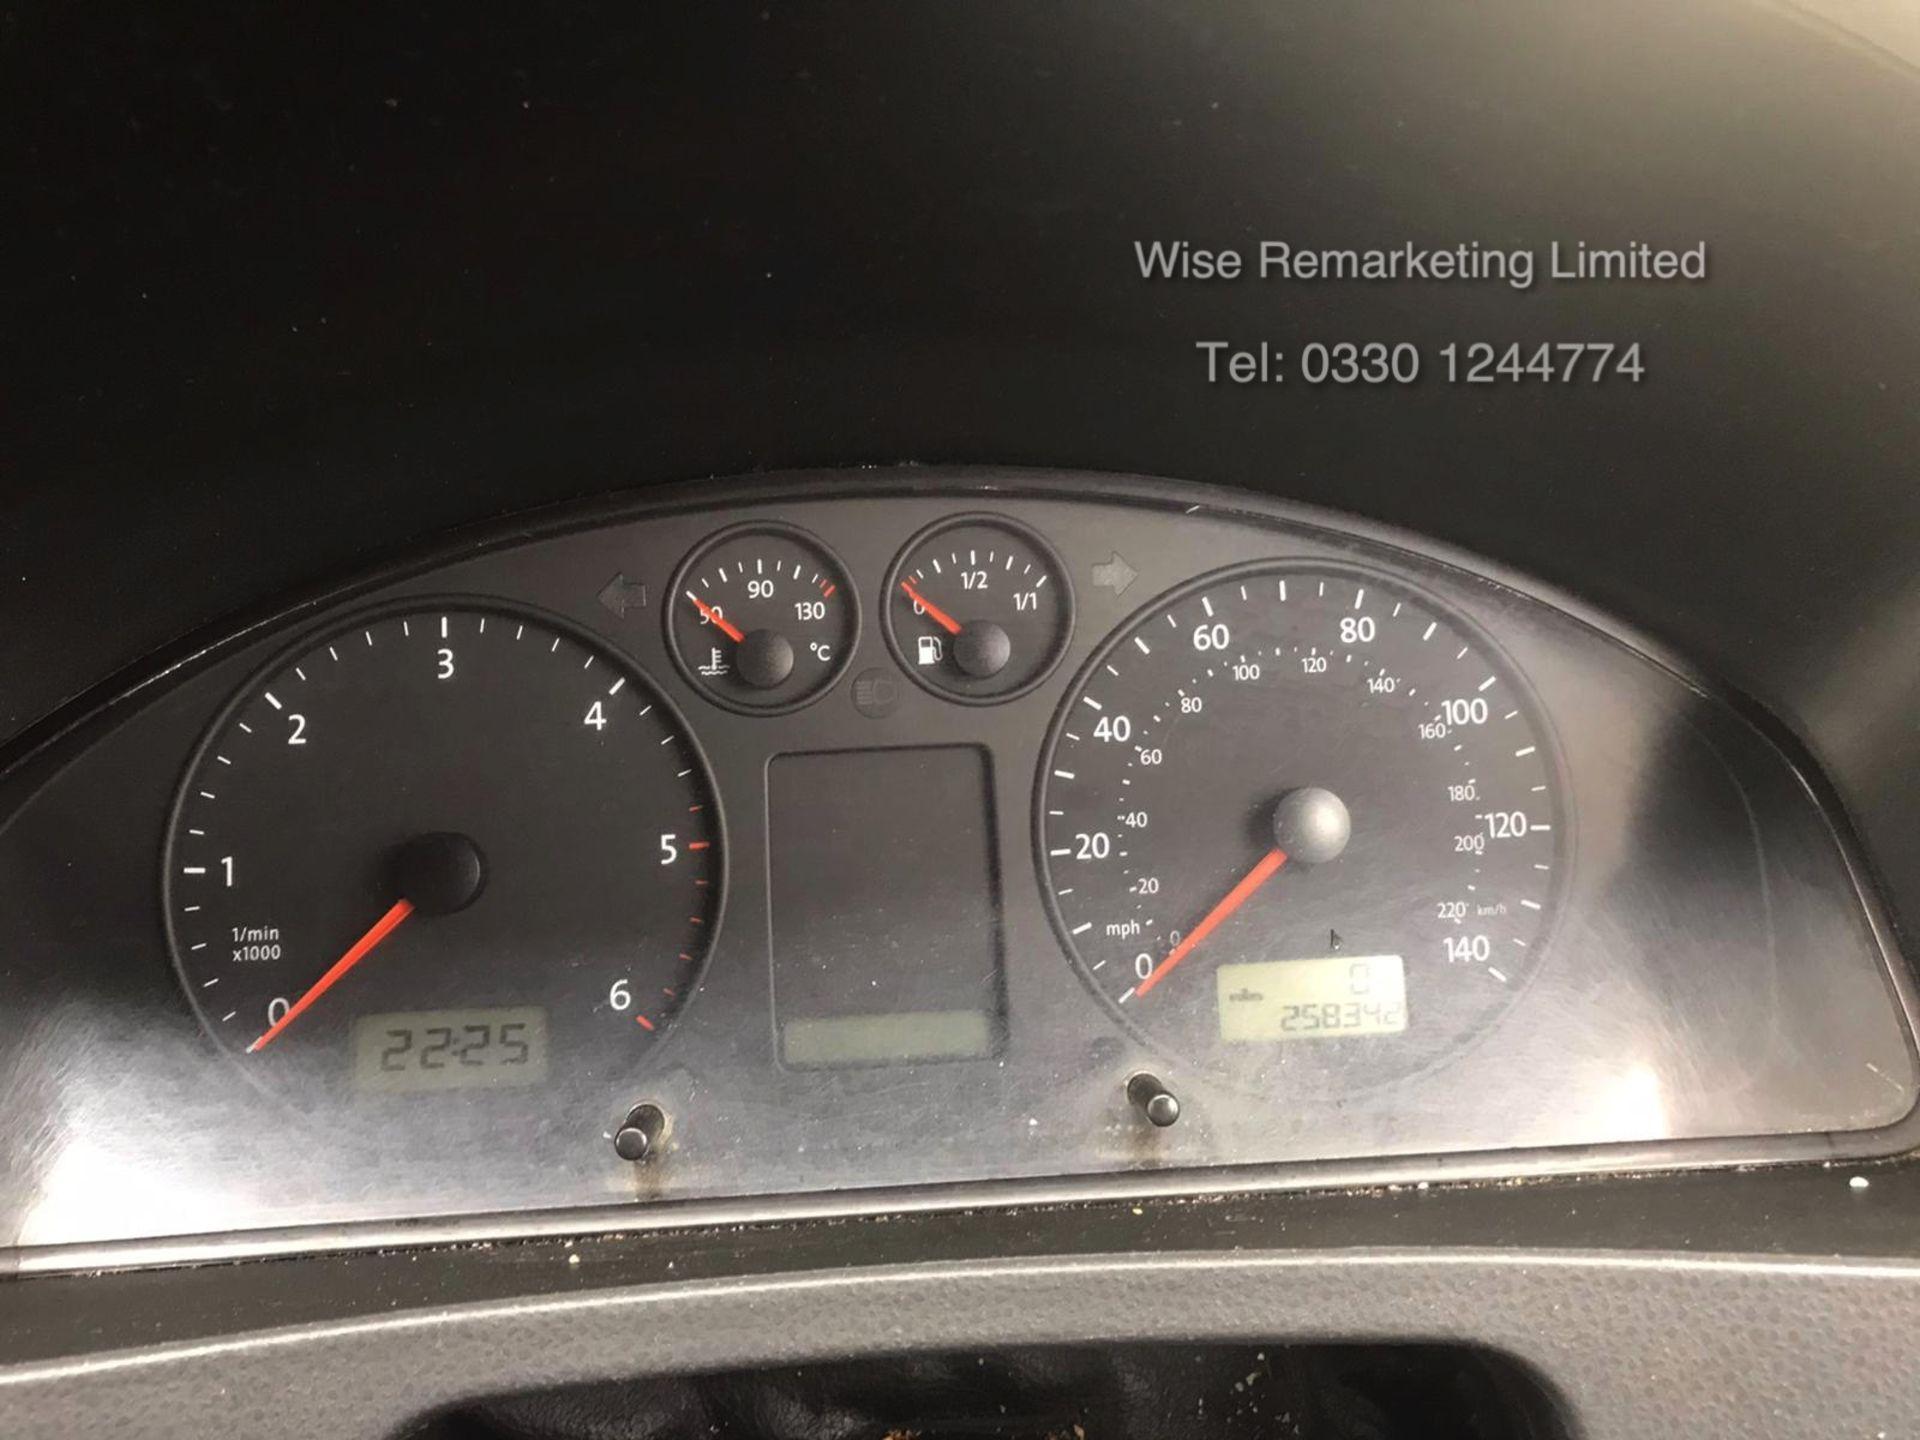 Lot 36 - ***RESERVE MET*** Volkswagen Transporter T30 130 2.5 Tdi Mini Bus - 2006 06 Reg - Auto - LWB